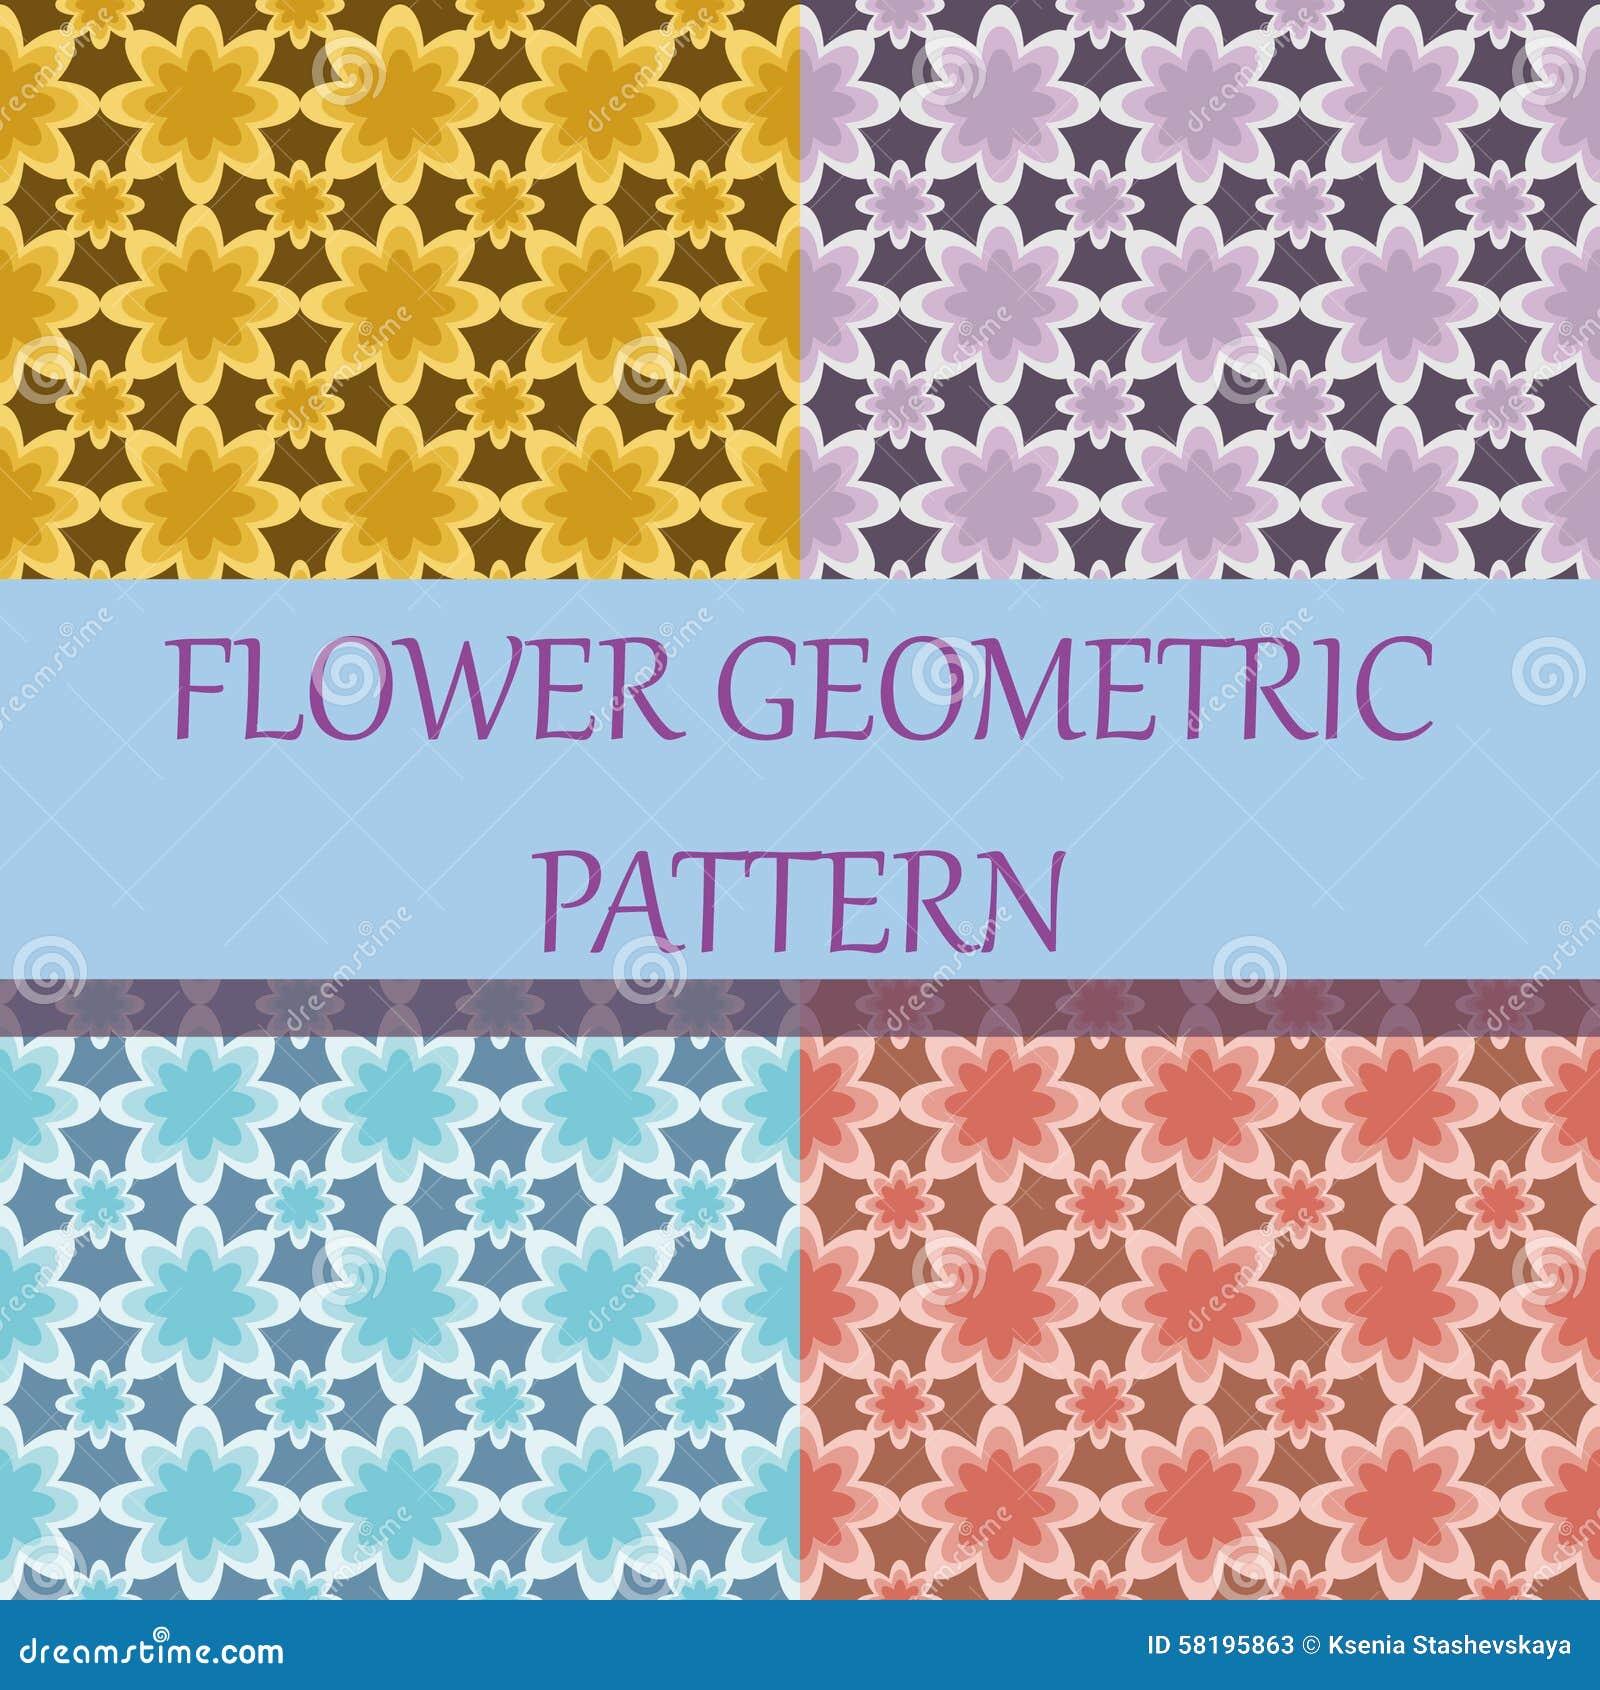 Flower Geometric Background Pattern